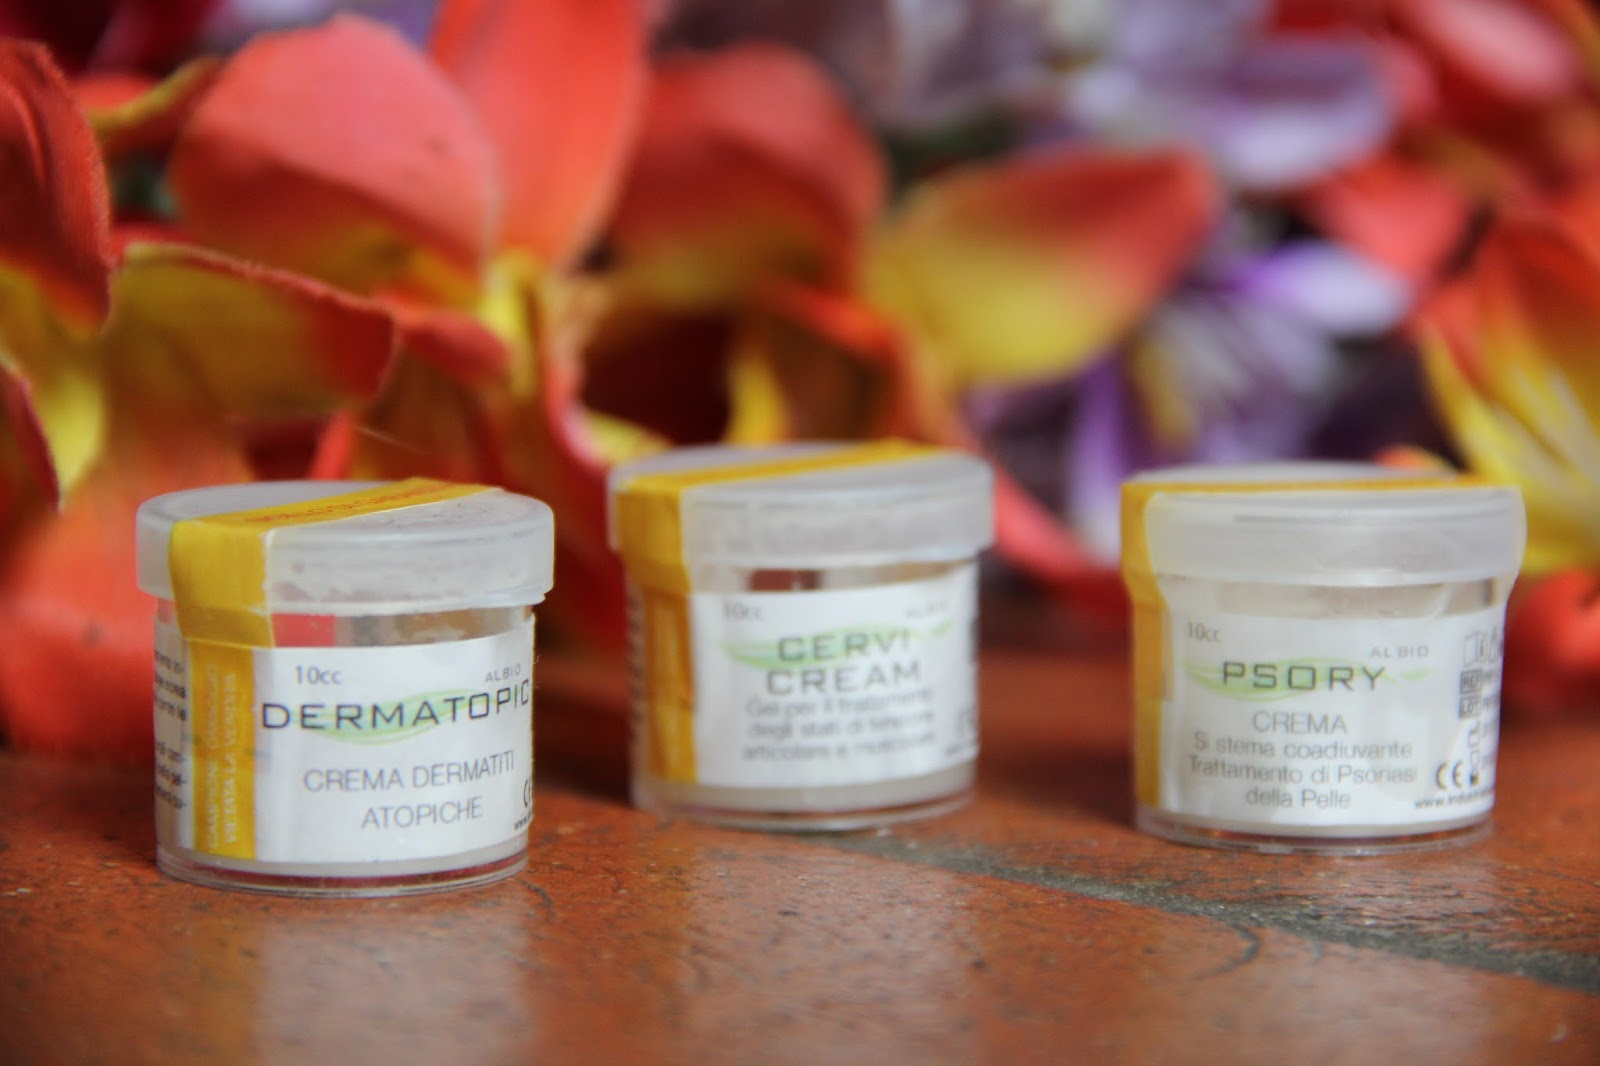 Aromatherapy per cura di psoriasi